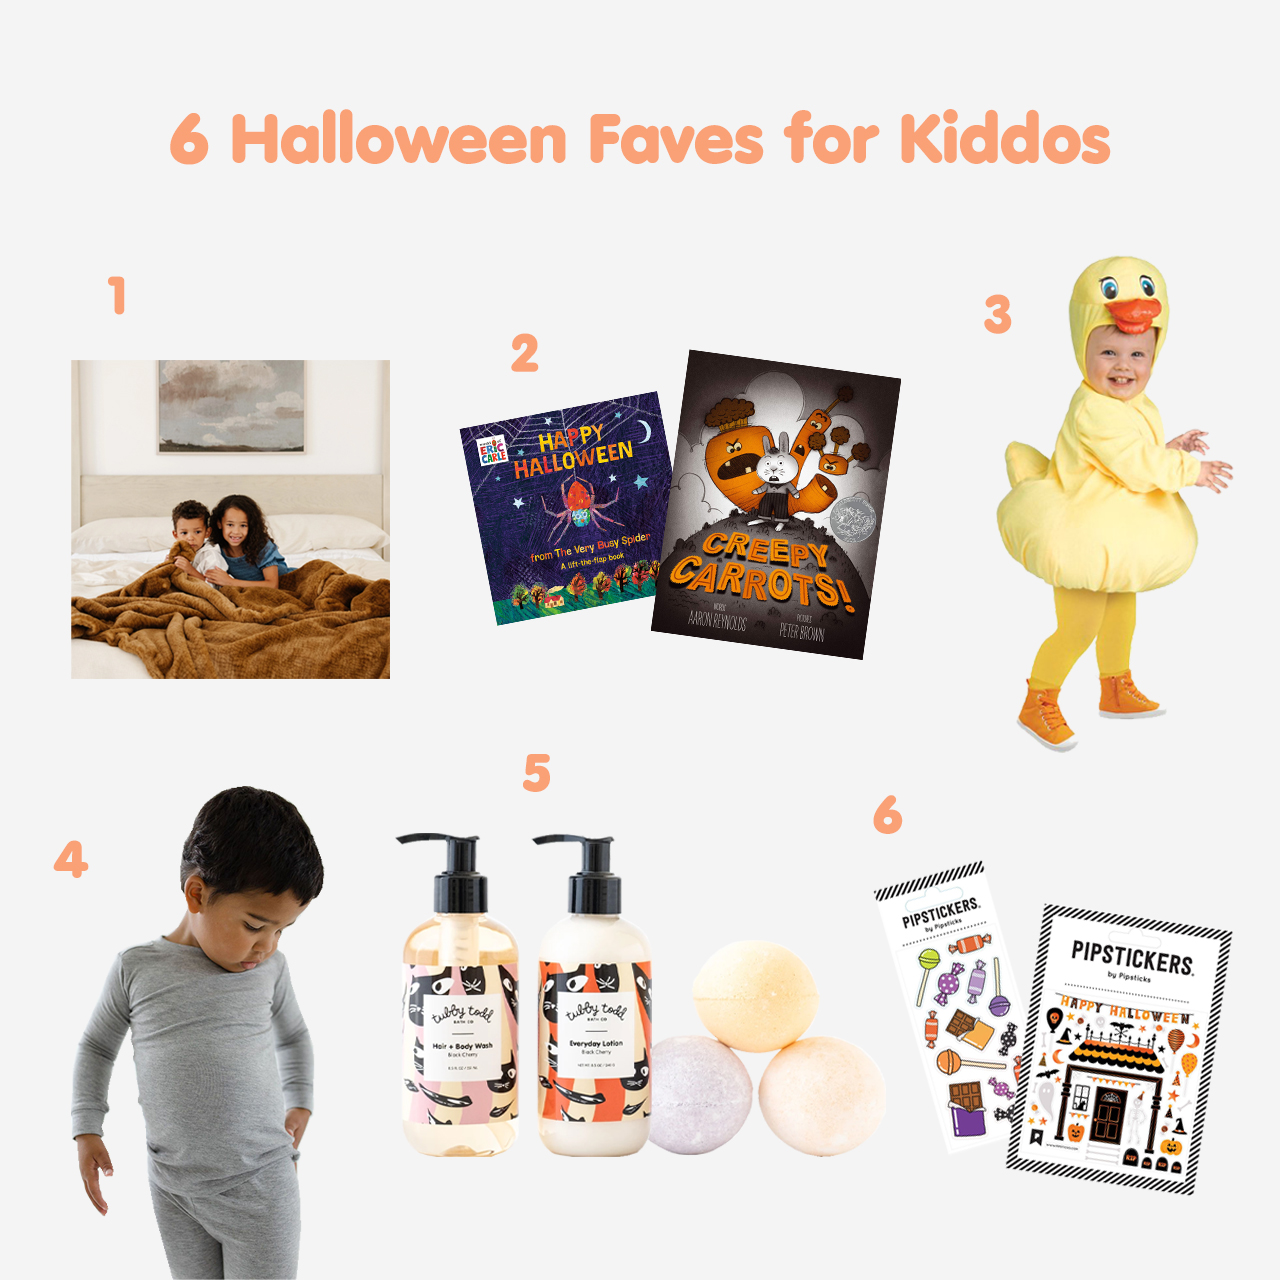 6 Favorite Halloween Goodies for Kiddos